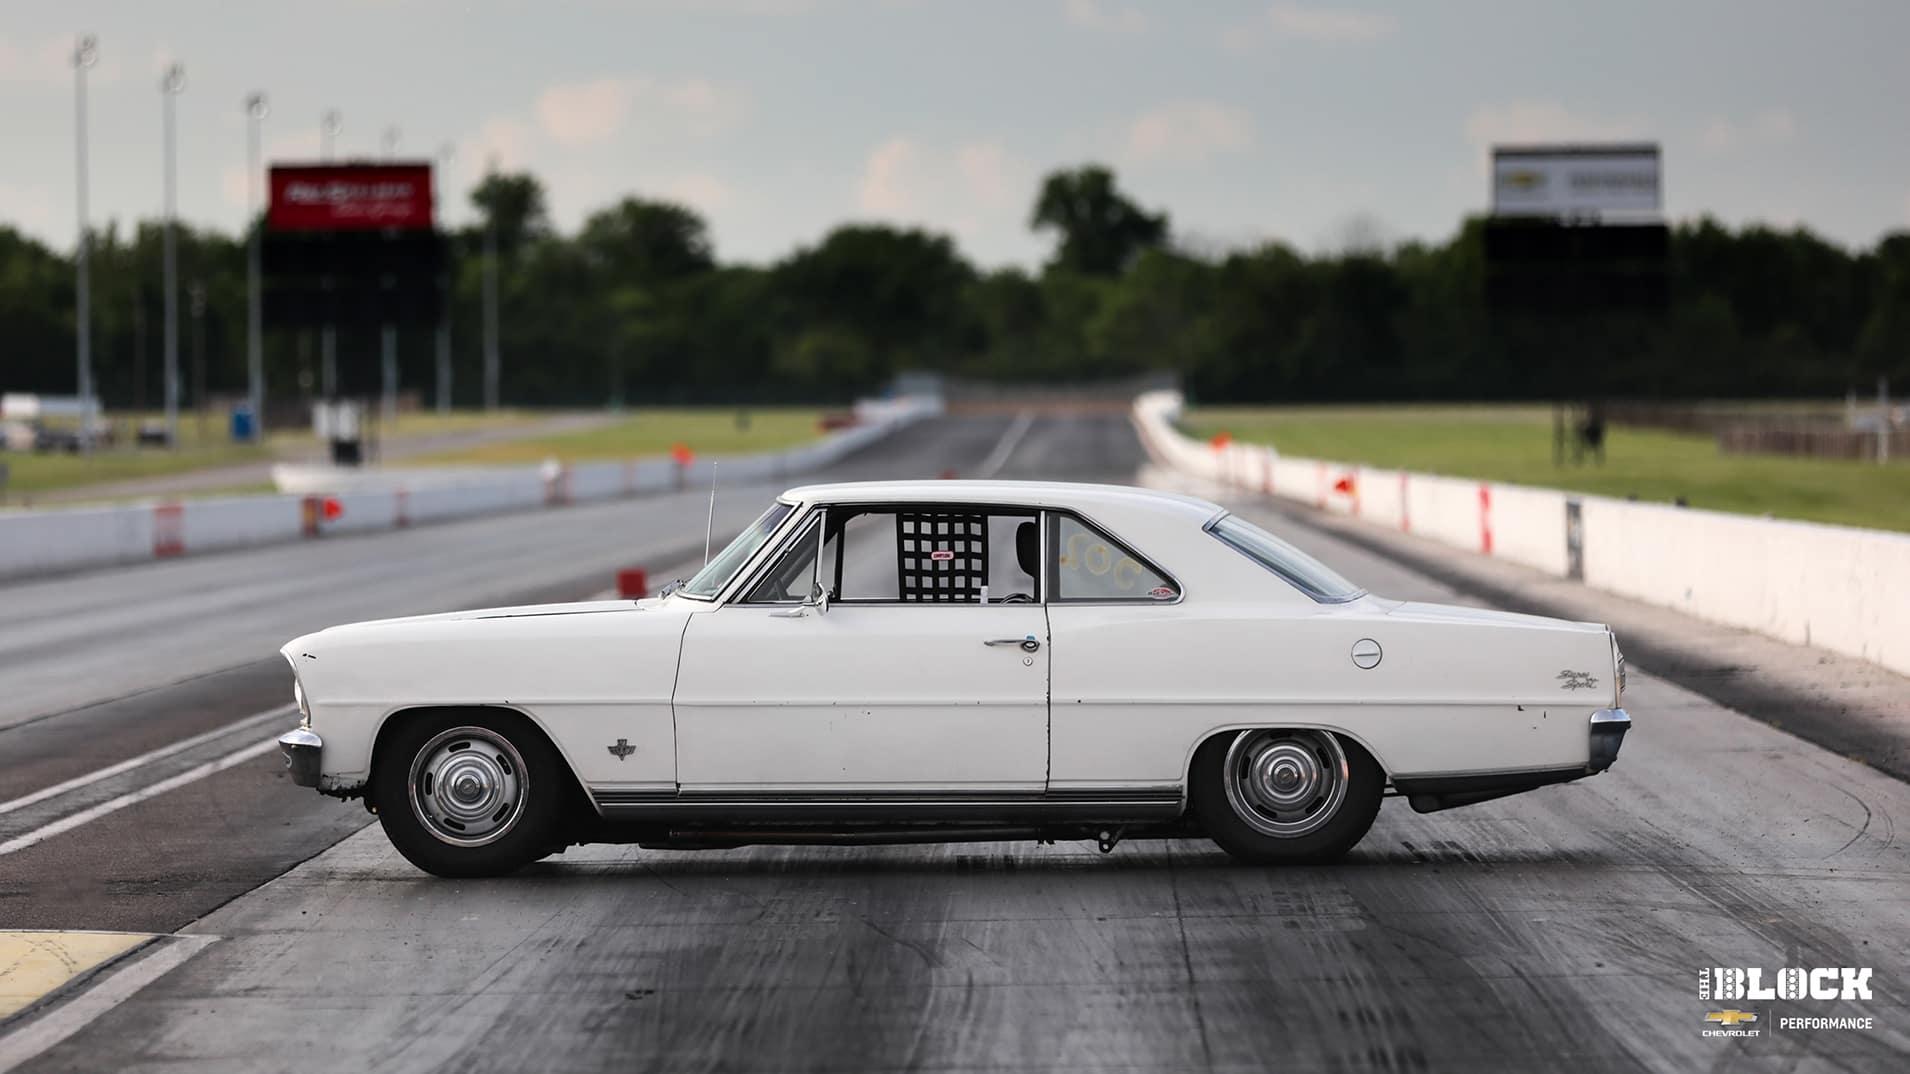 Chevy Nova on Race Track